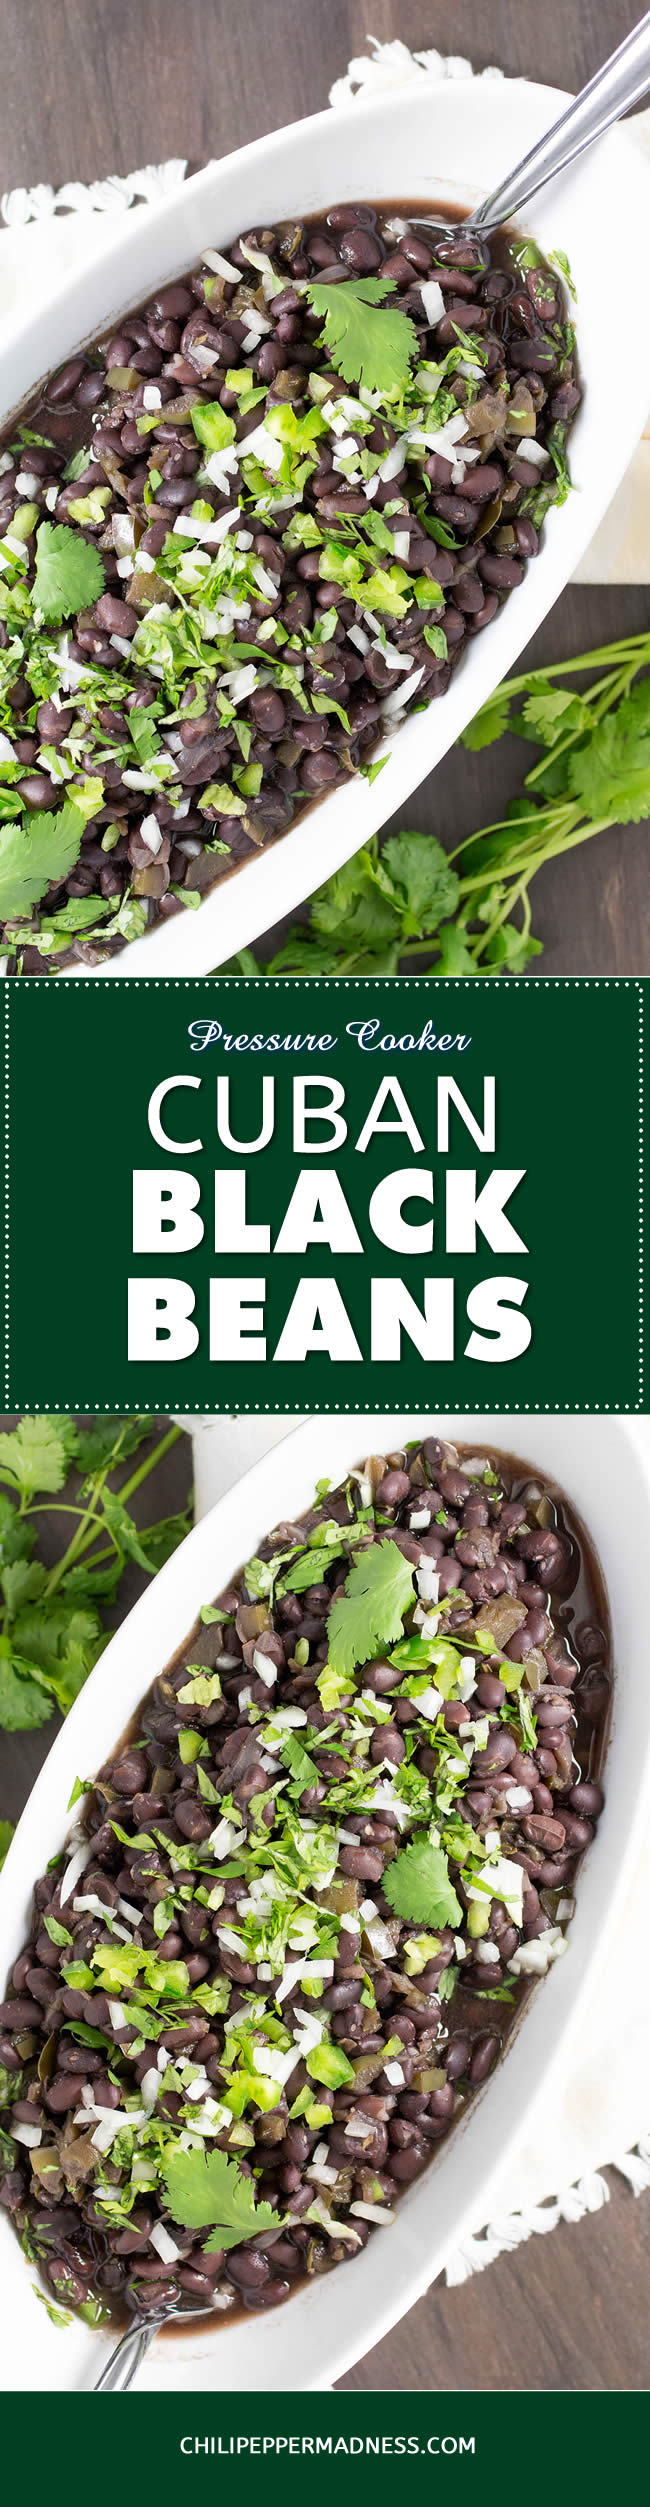 Pressure Cooker Cuban Black Beans - Recipe